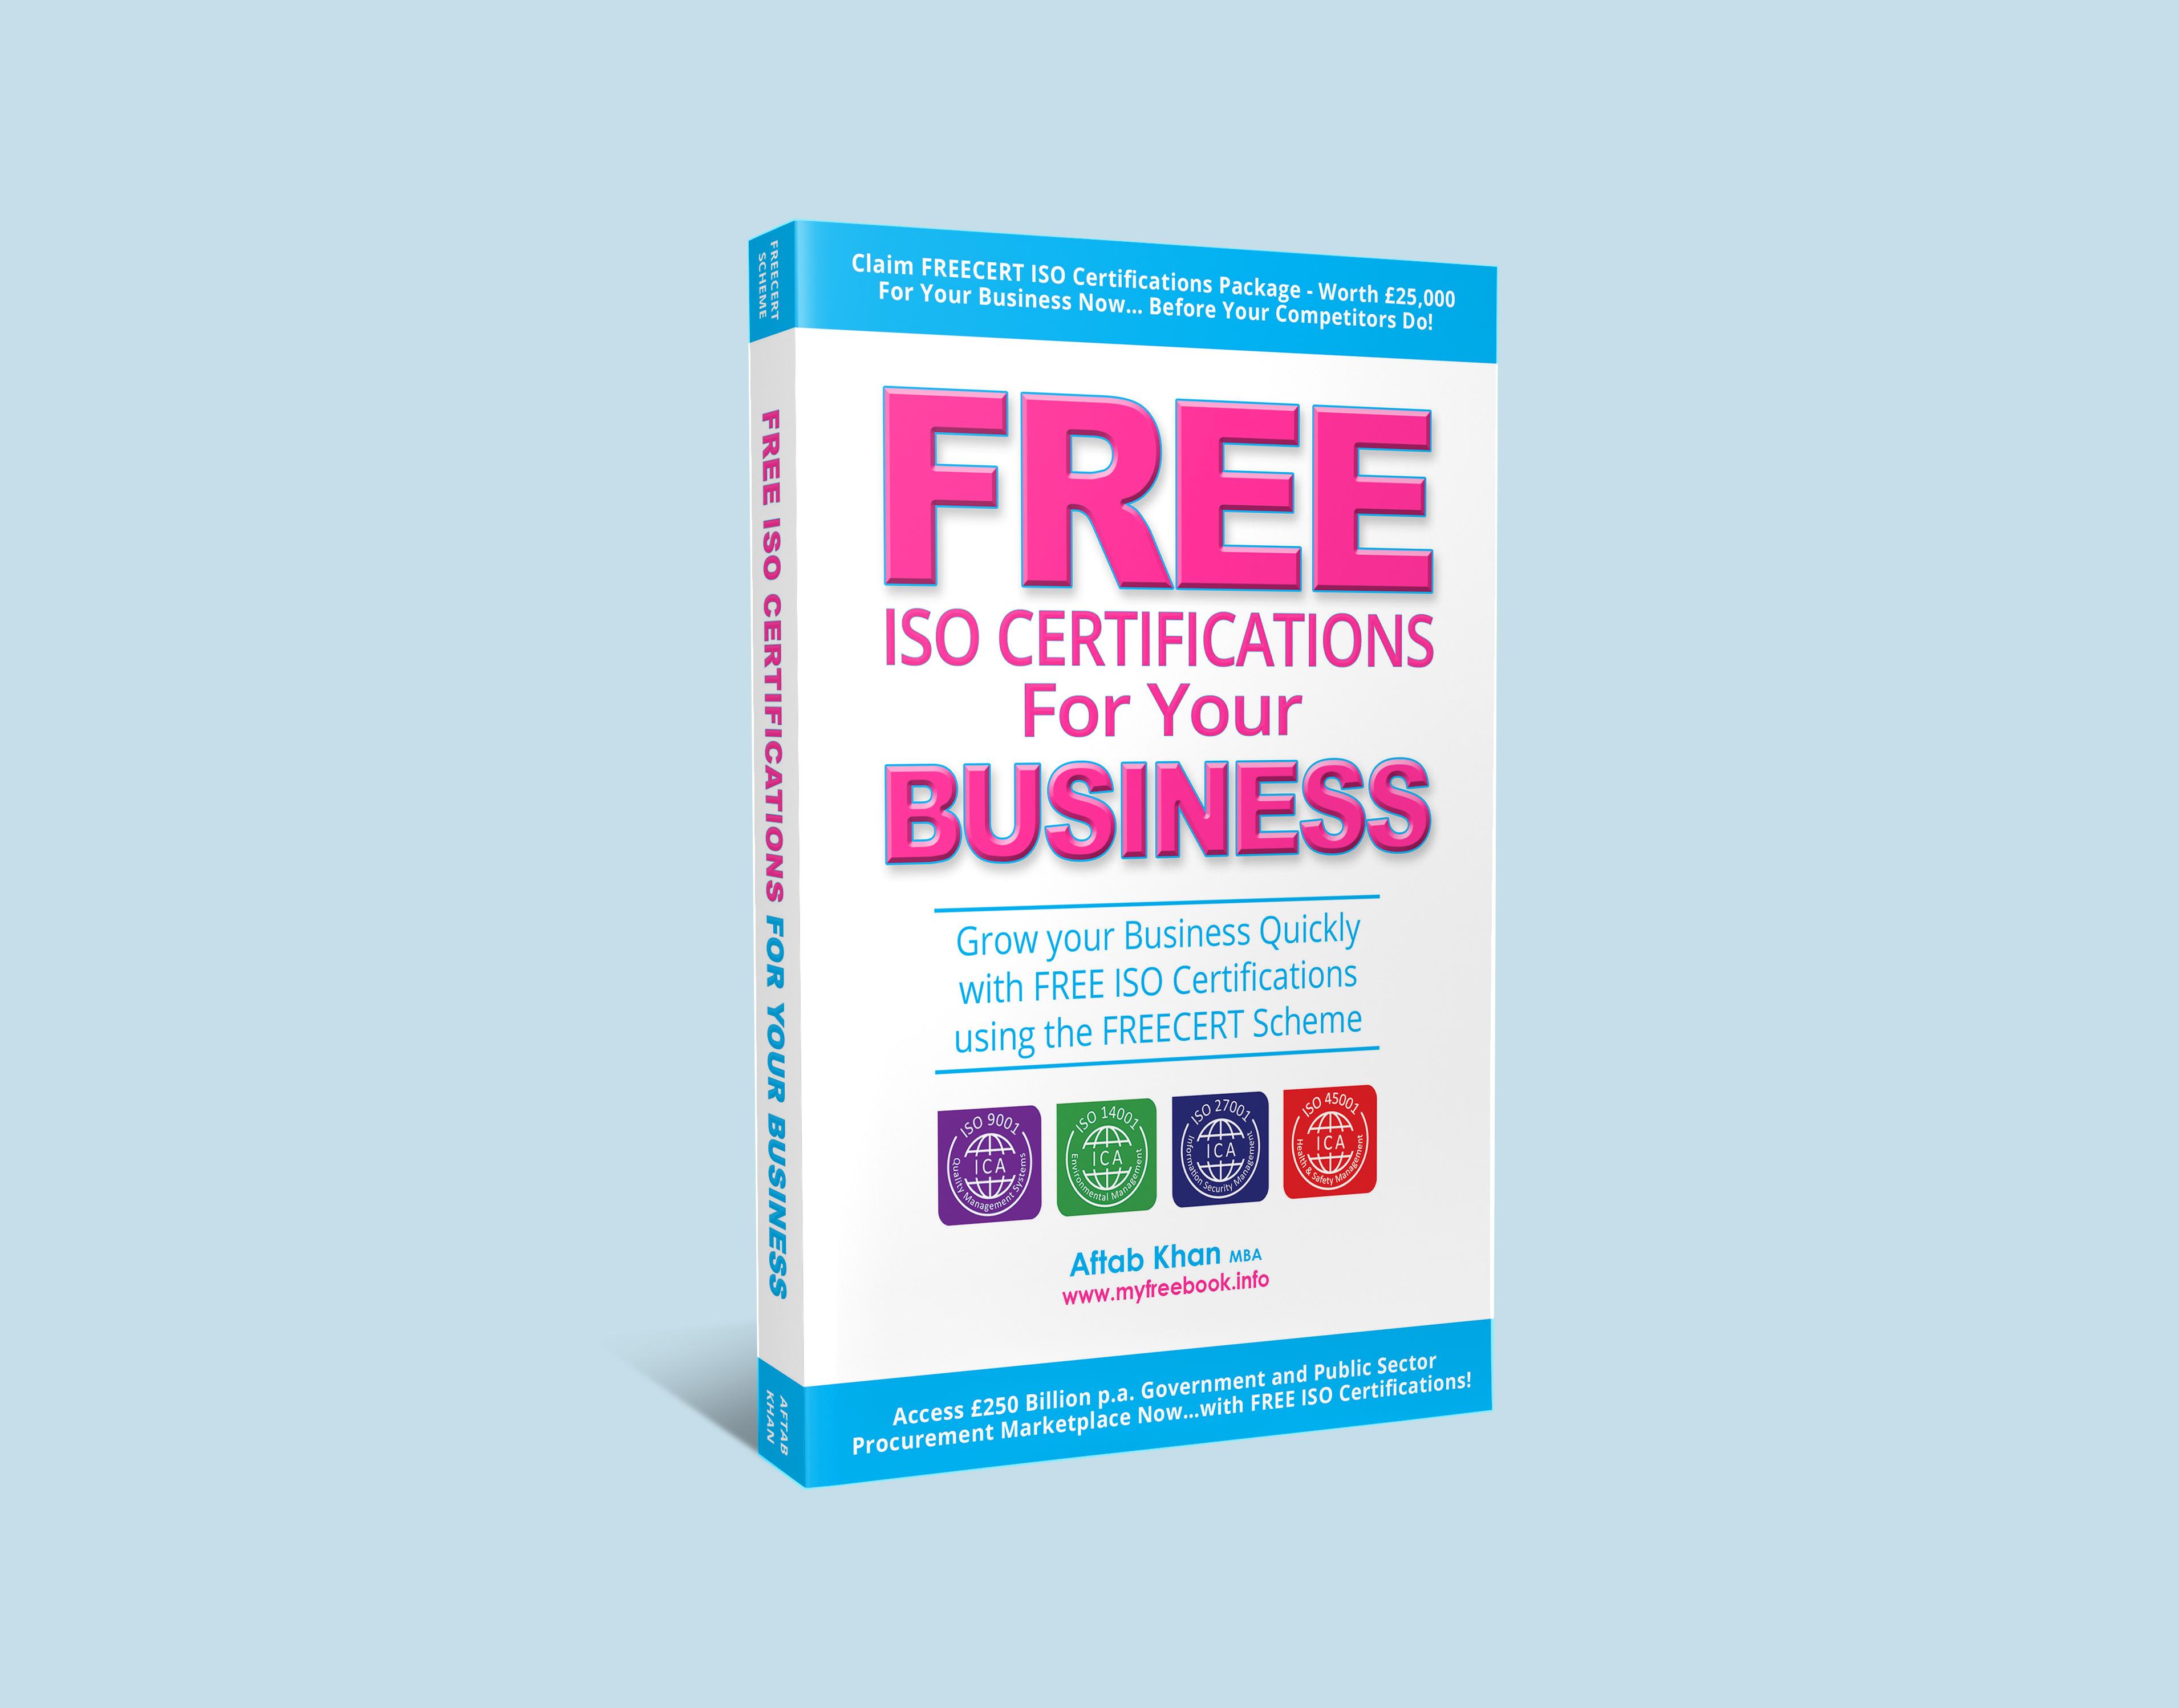 Support Freecert Iso Certifications Scheme